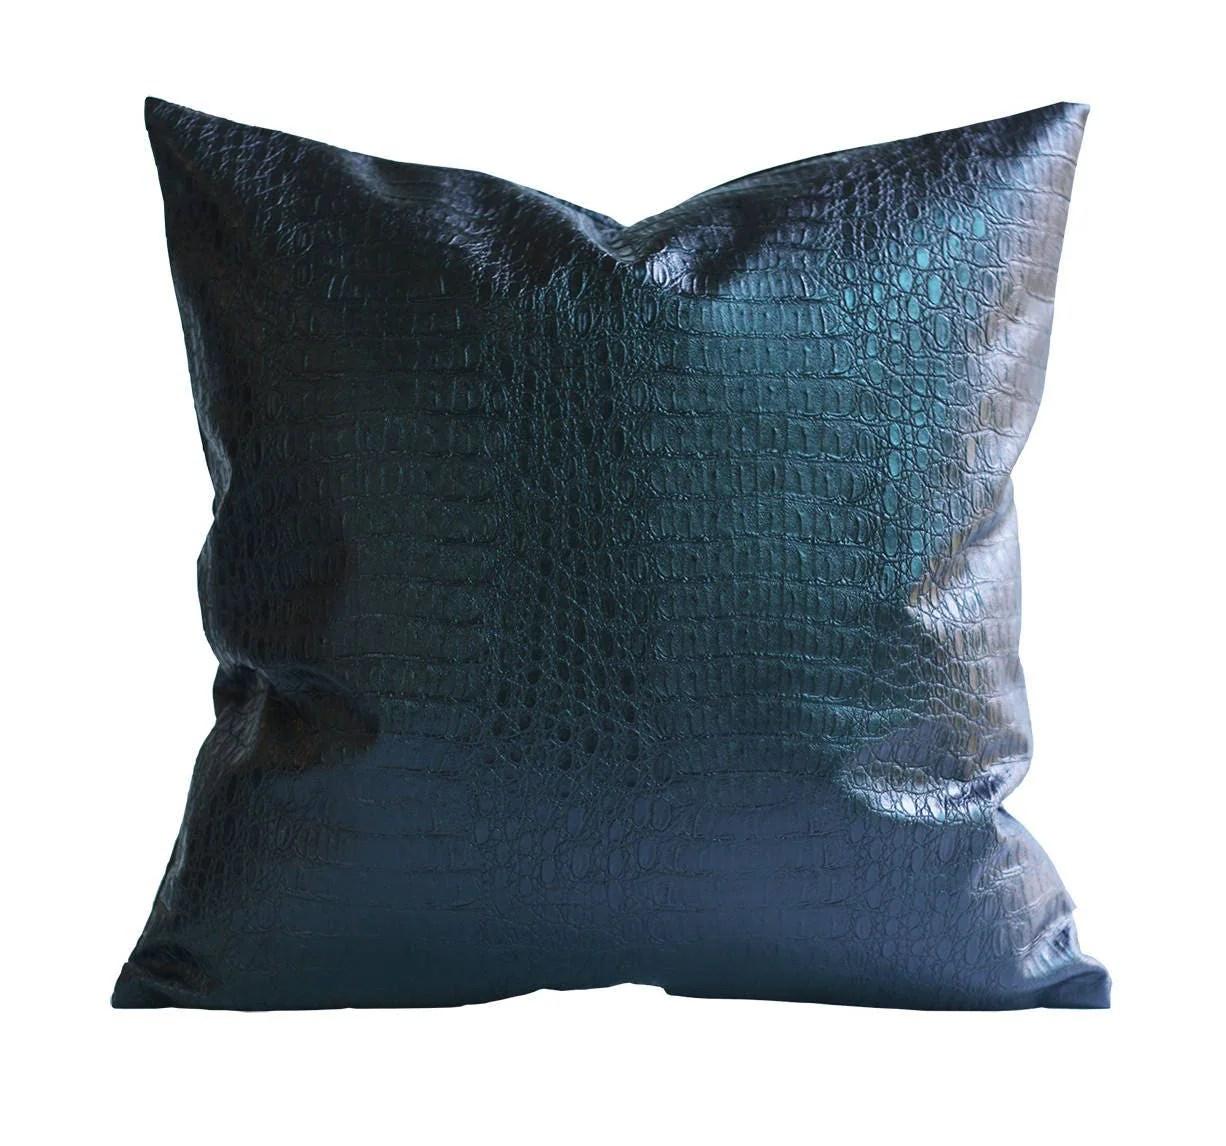 Kdays Croc Faux Leather Black Pillow Cover Decorative For